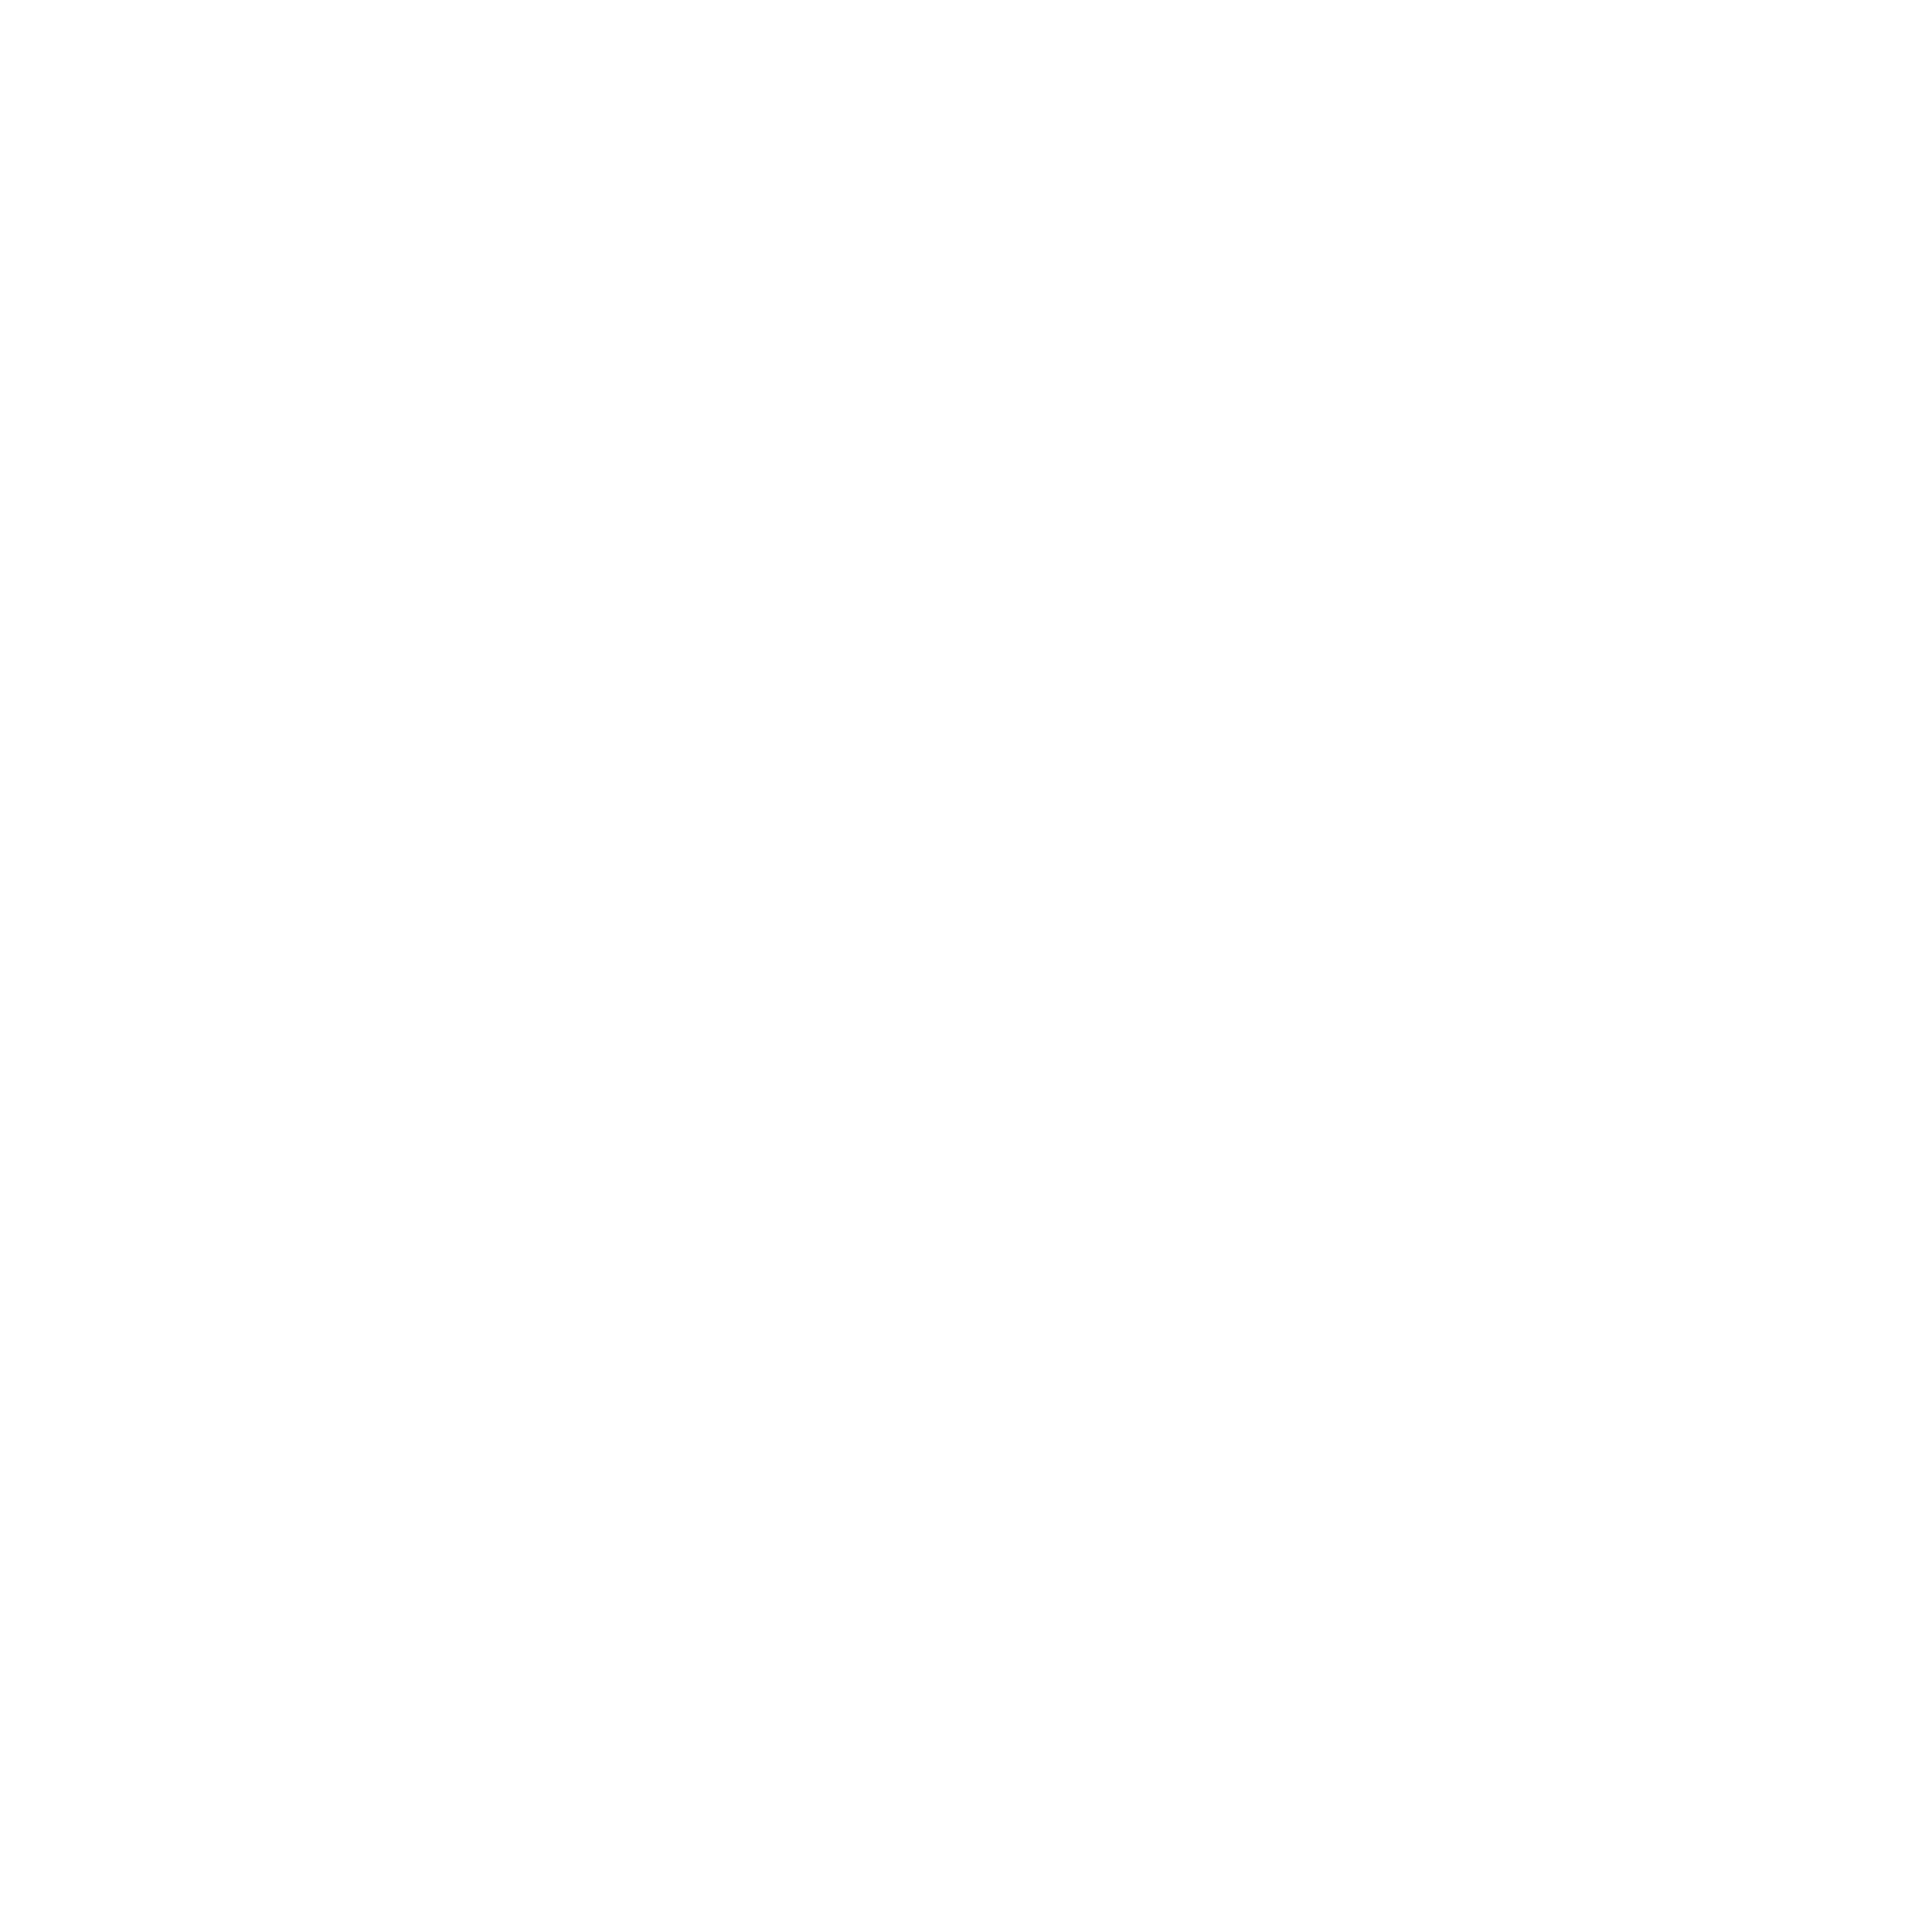 CAFECHO